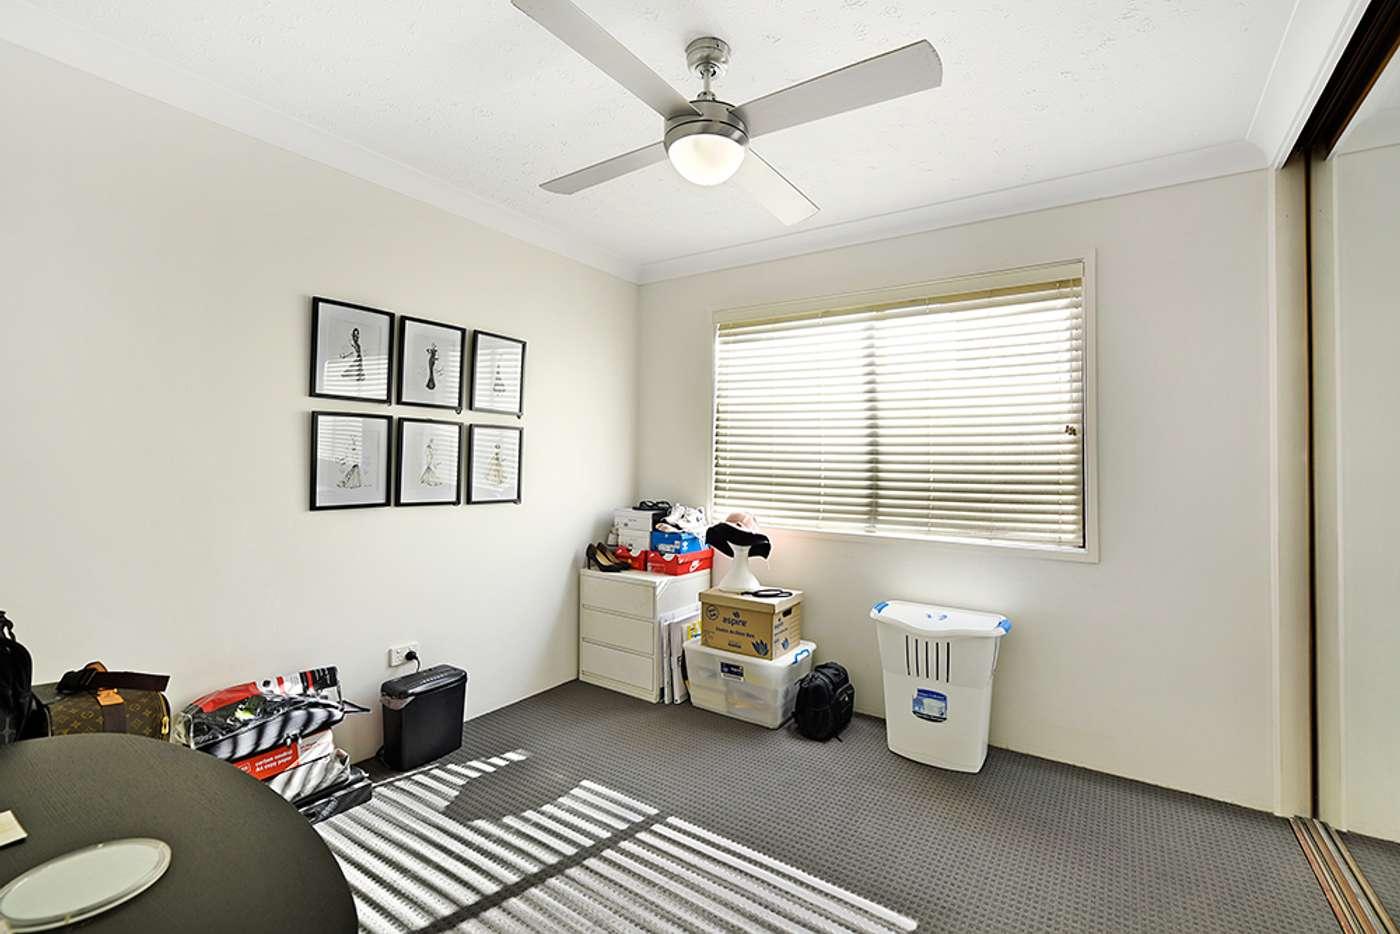 Seventh view of Homely unit listing, 4/11 Armrick Avenue, Broadbeach QLD 4218